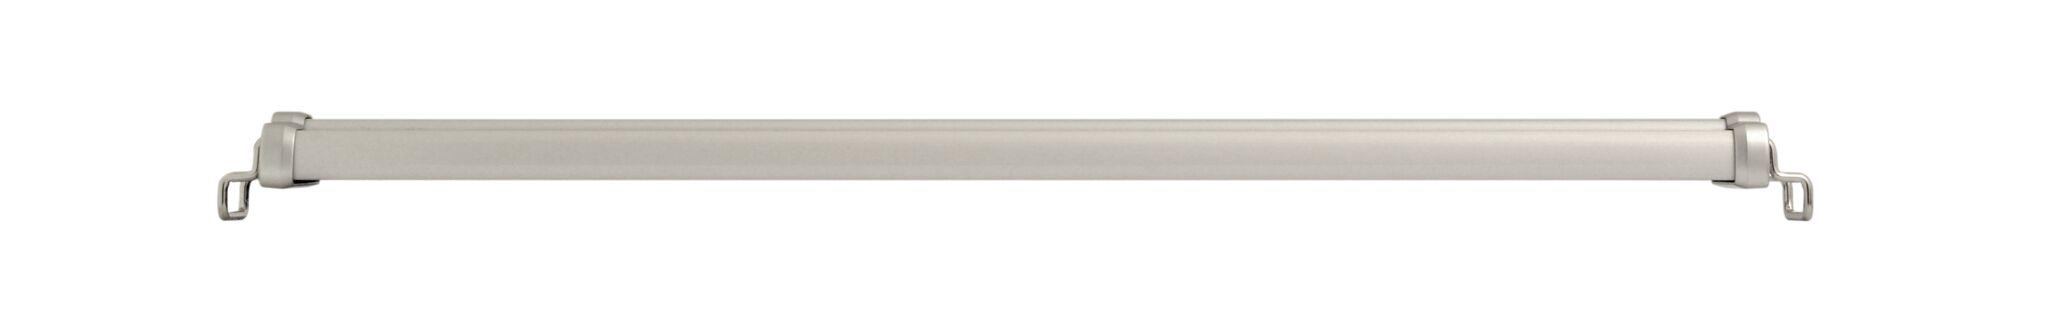 Aquarium Systems Proten LED bar marine 600 - 900mm 20W